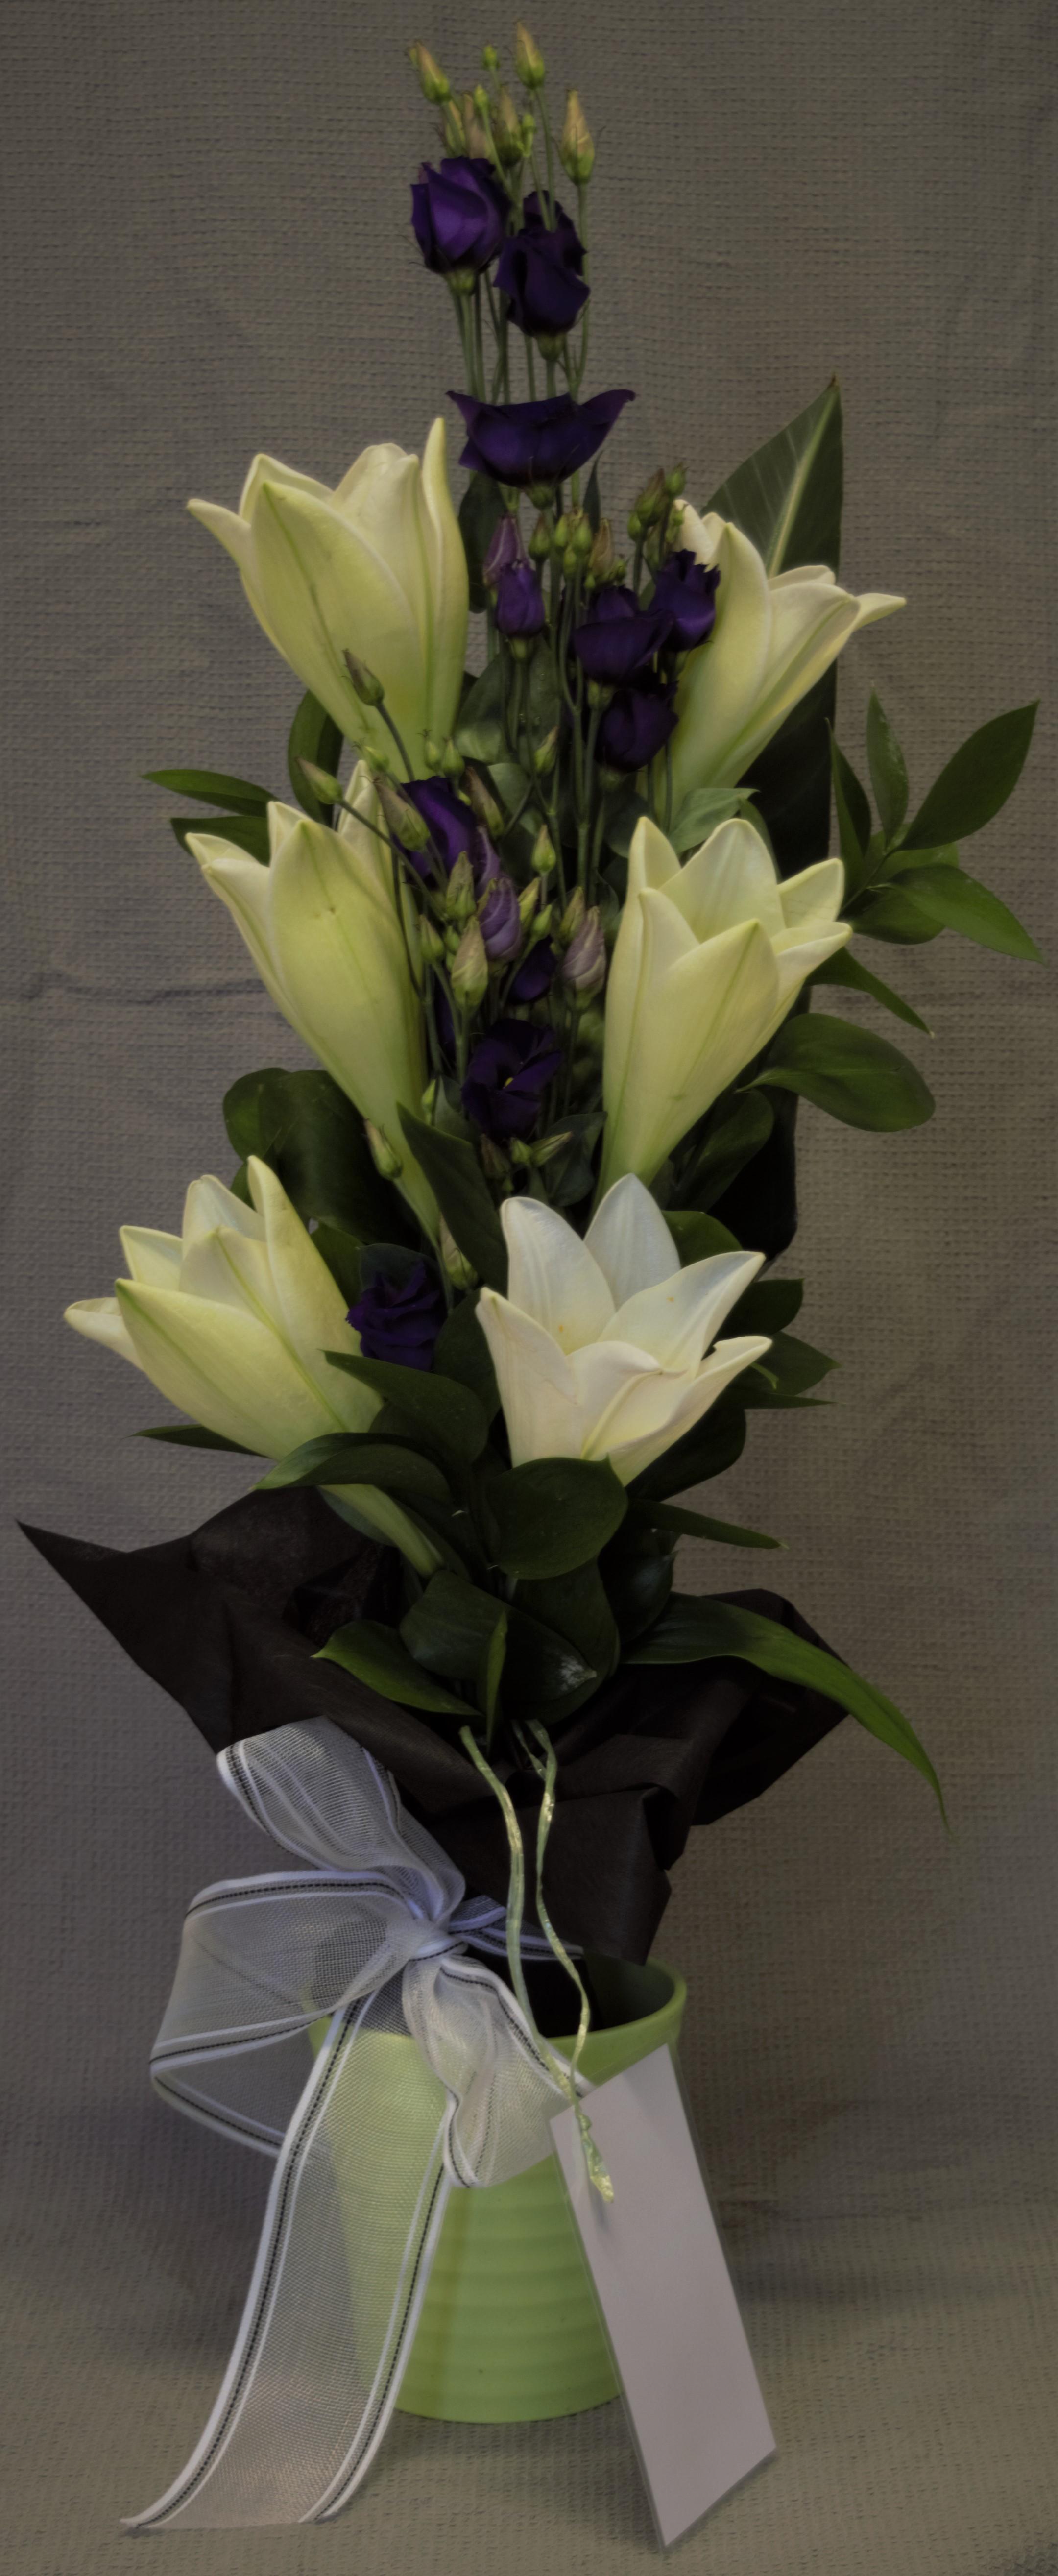 Kimppu 40e (lilja,eustoma)